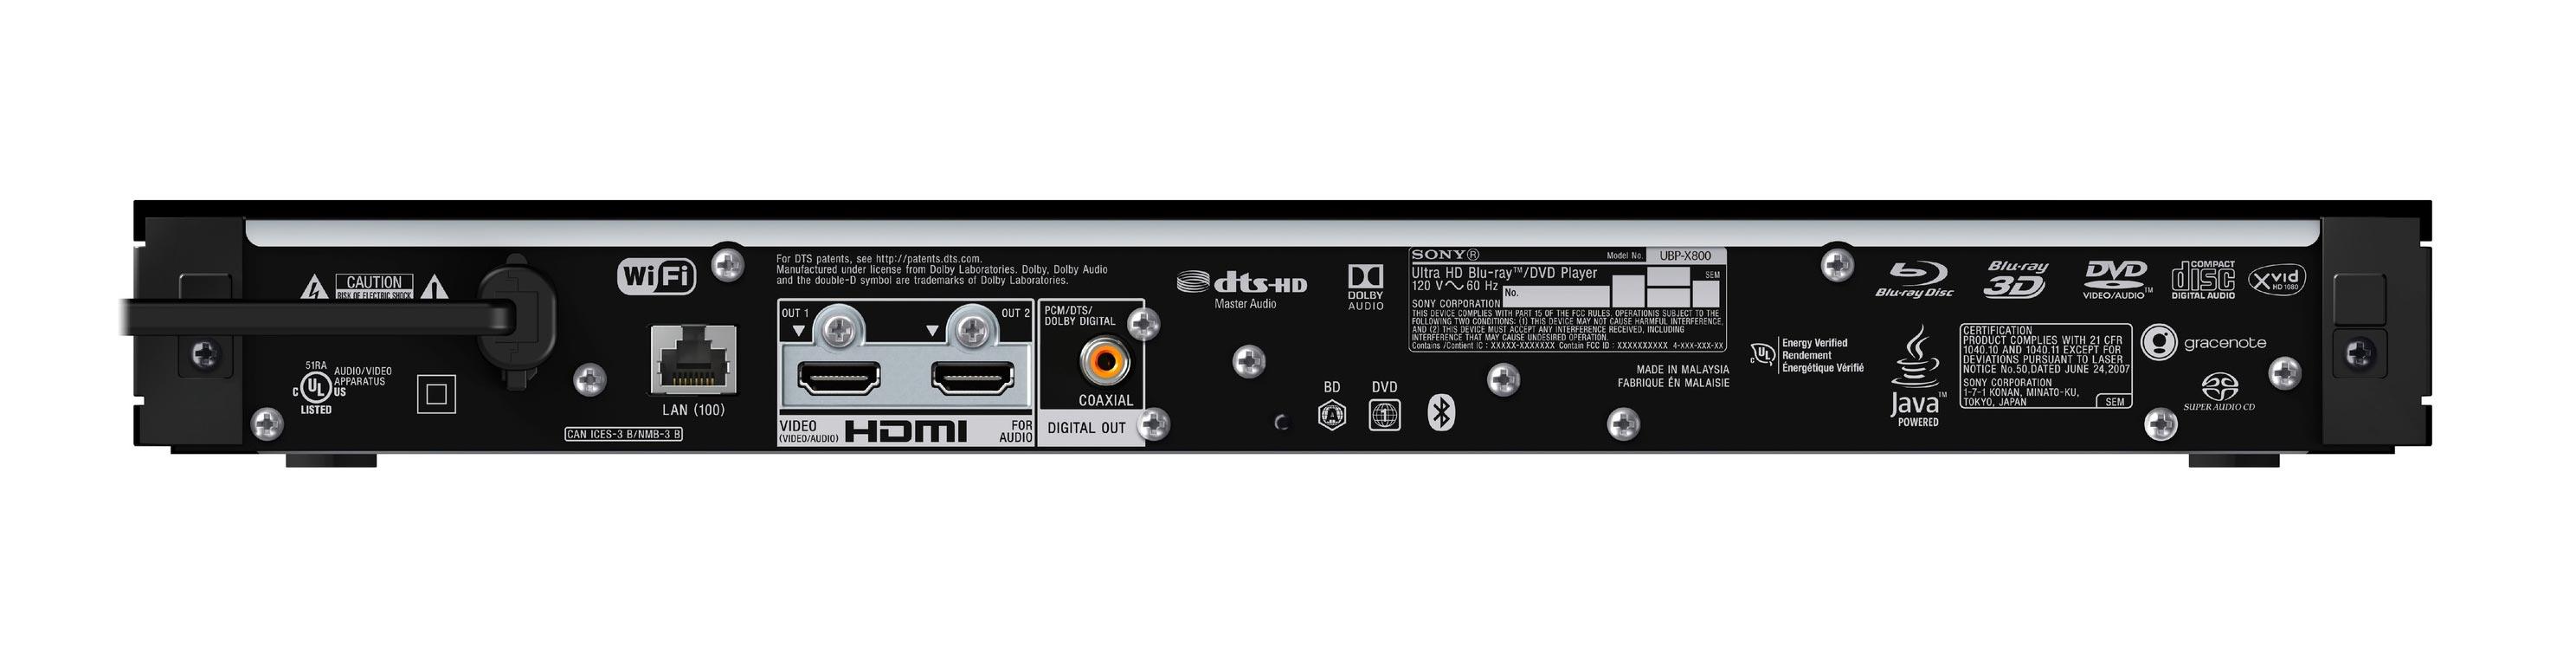 Sony Dvd Player Usb